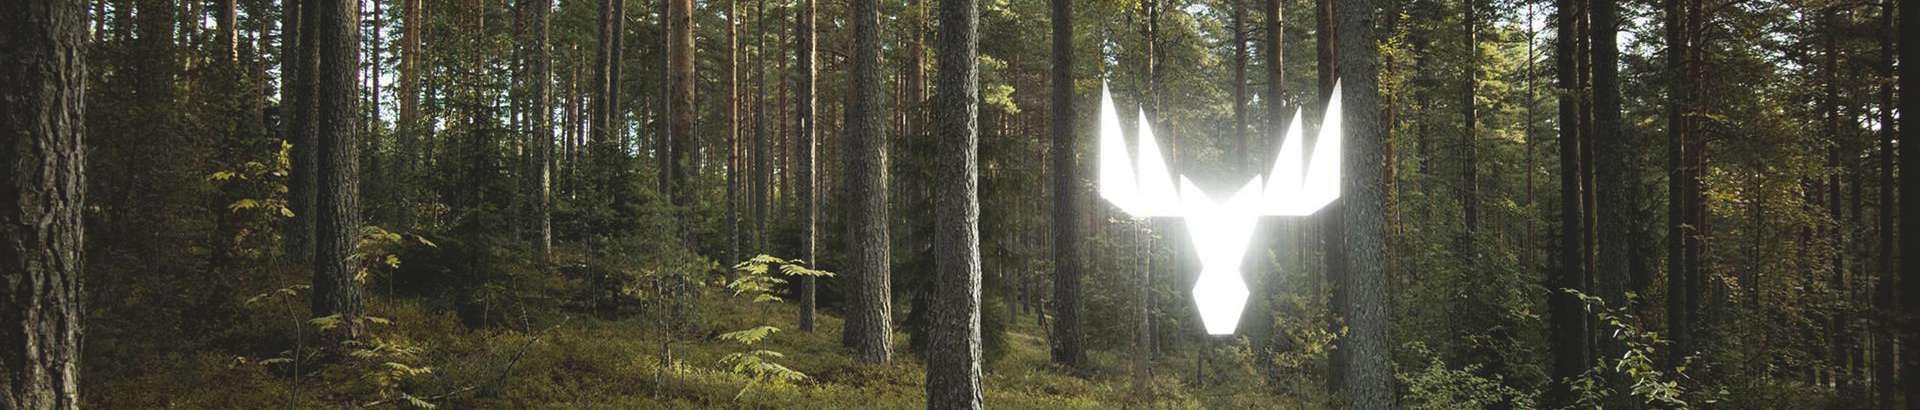 14082970_metsa-wood-eesti-as_71025015_xl.jpg